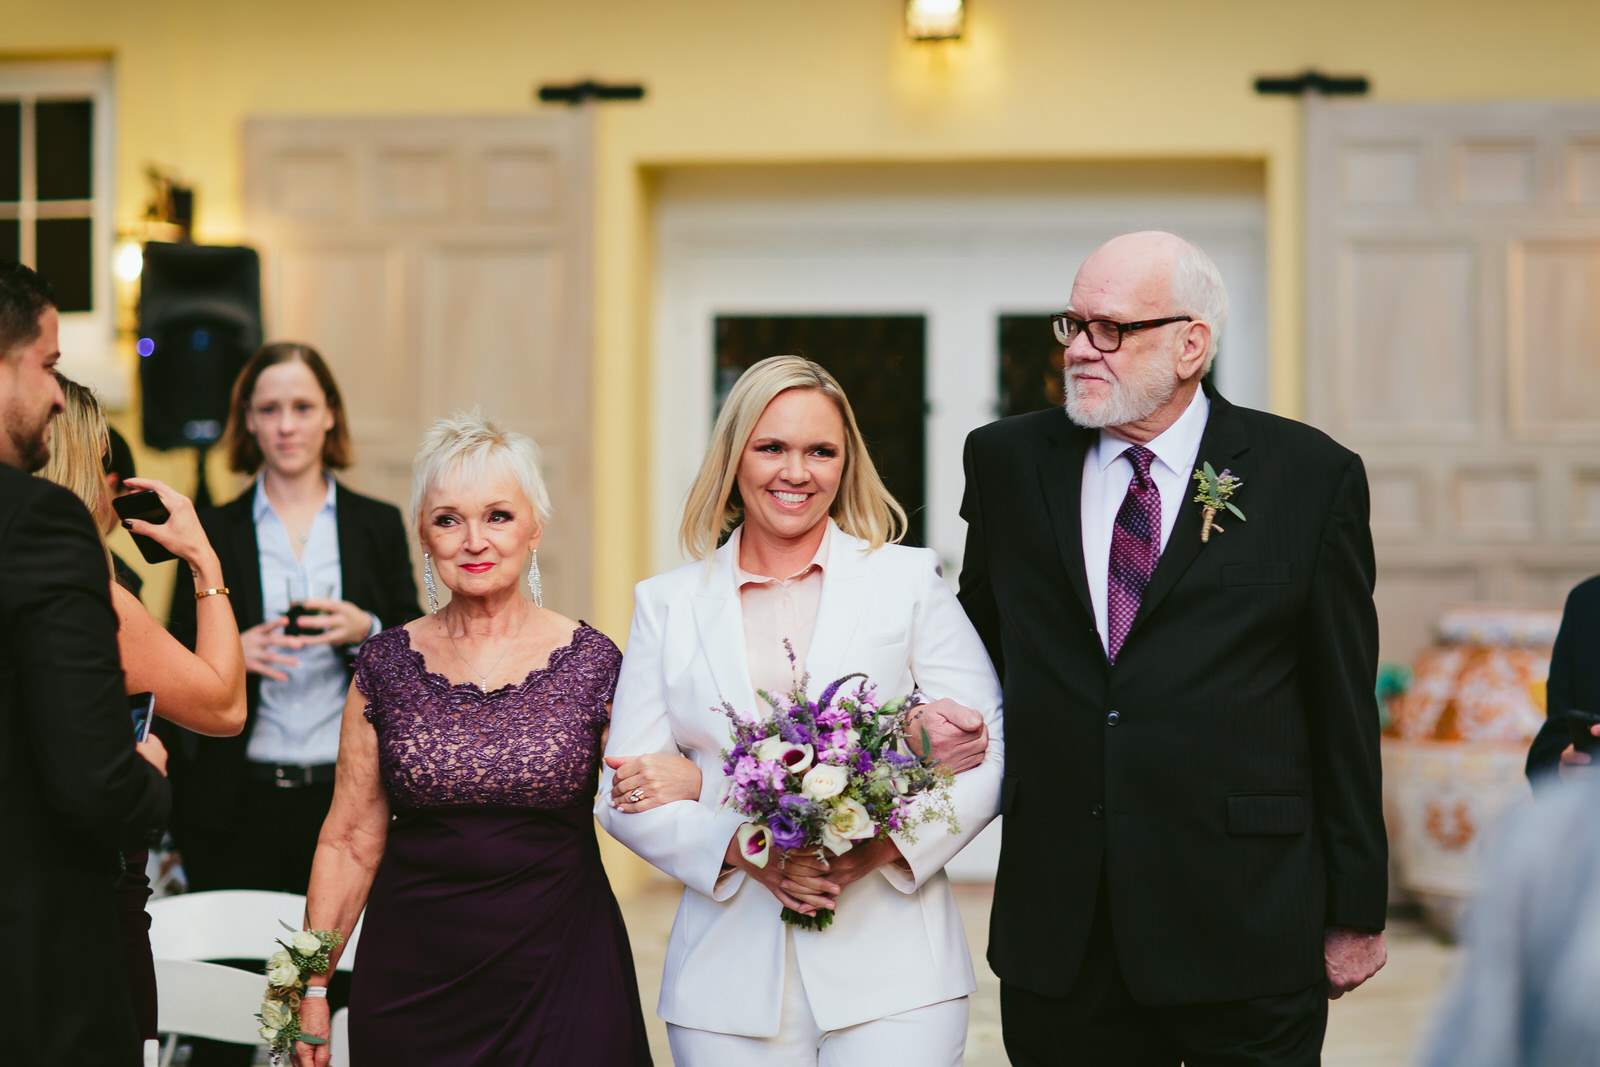 two_brides_weddding_tiny_house_photo_ceremony_the_addison_wedding.jpg